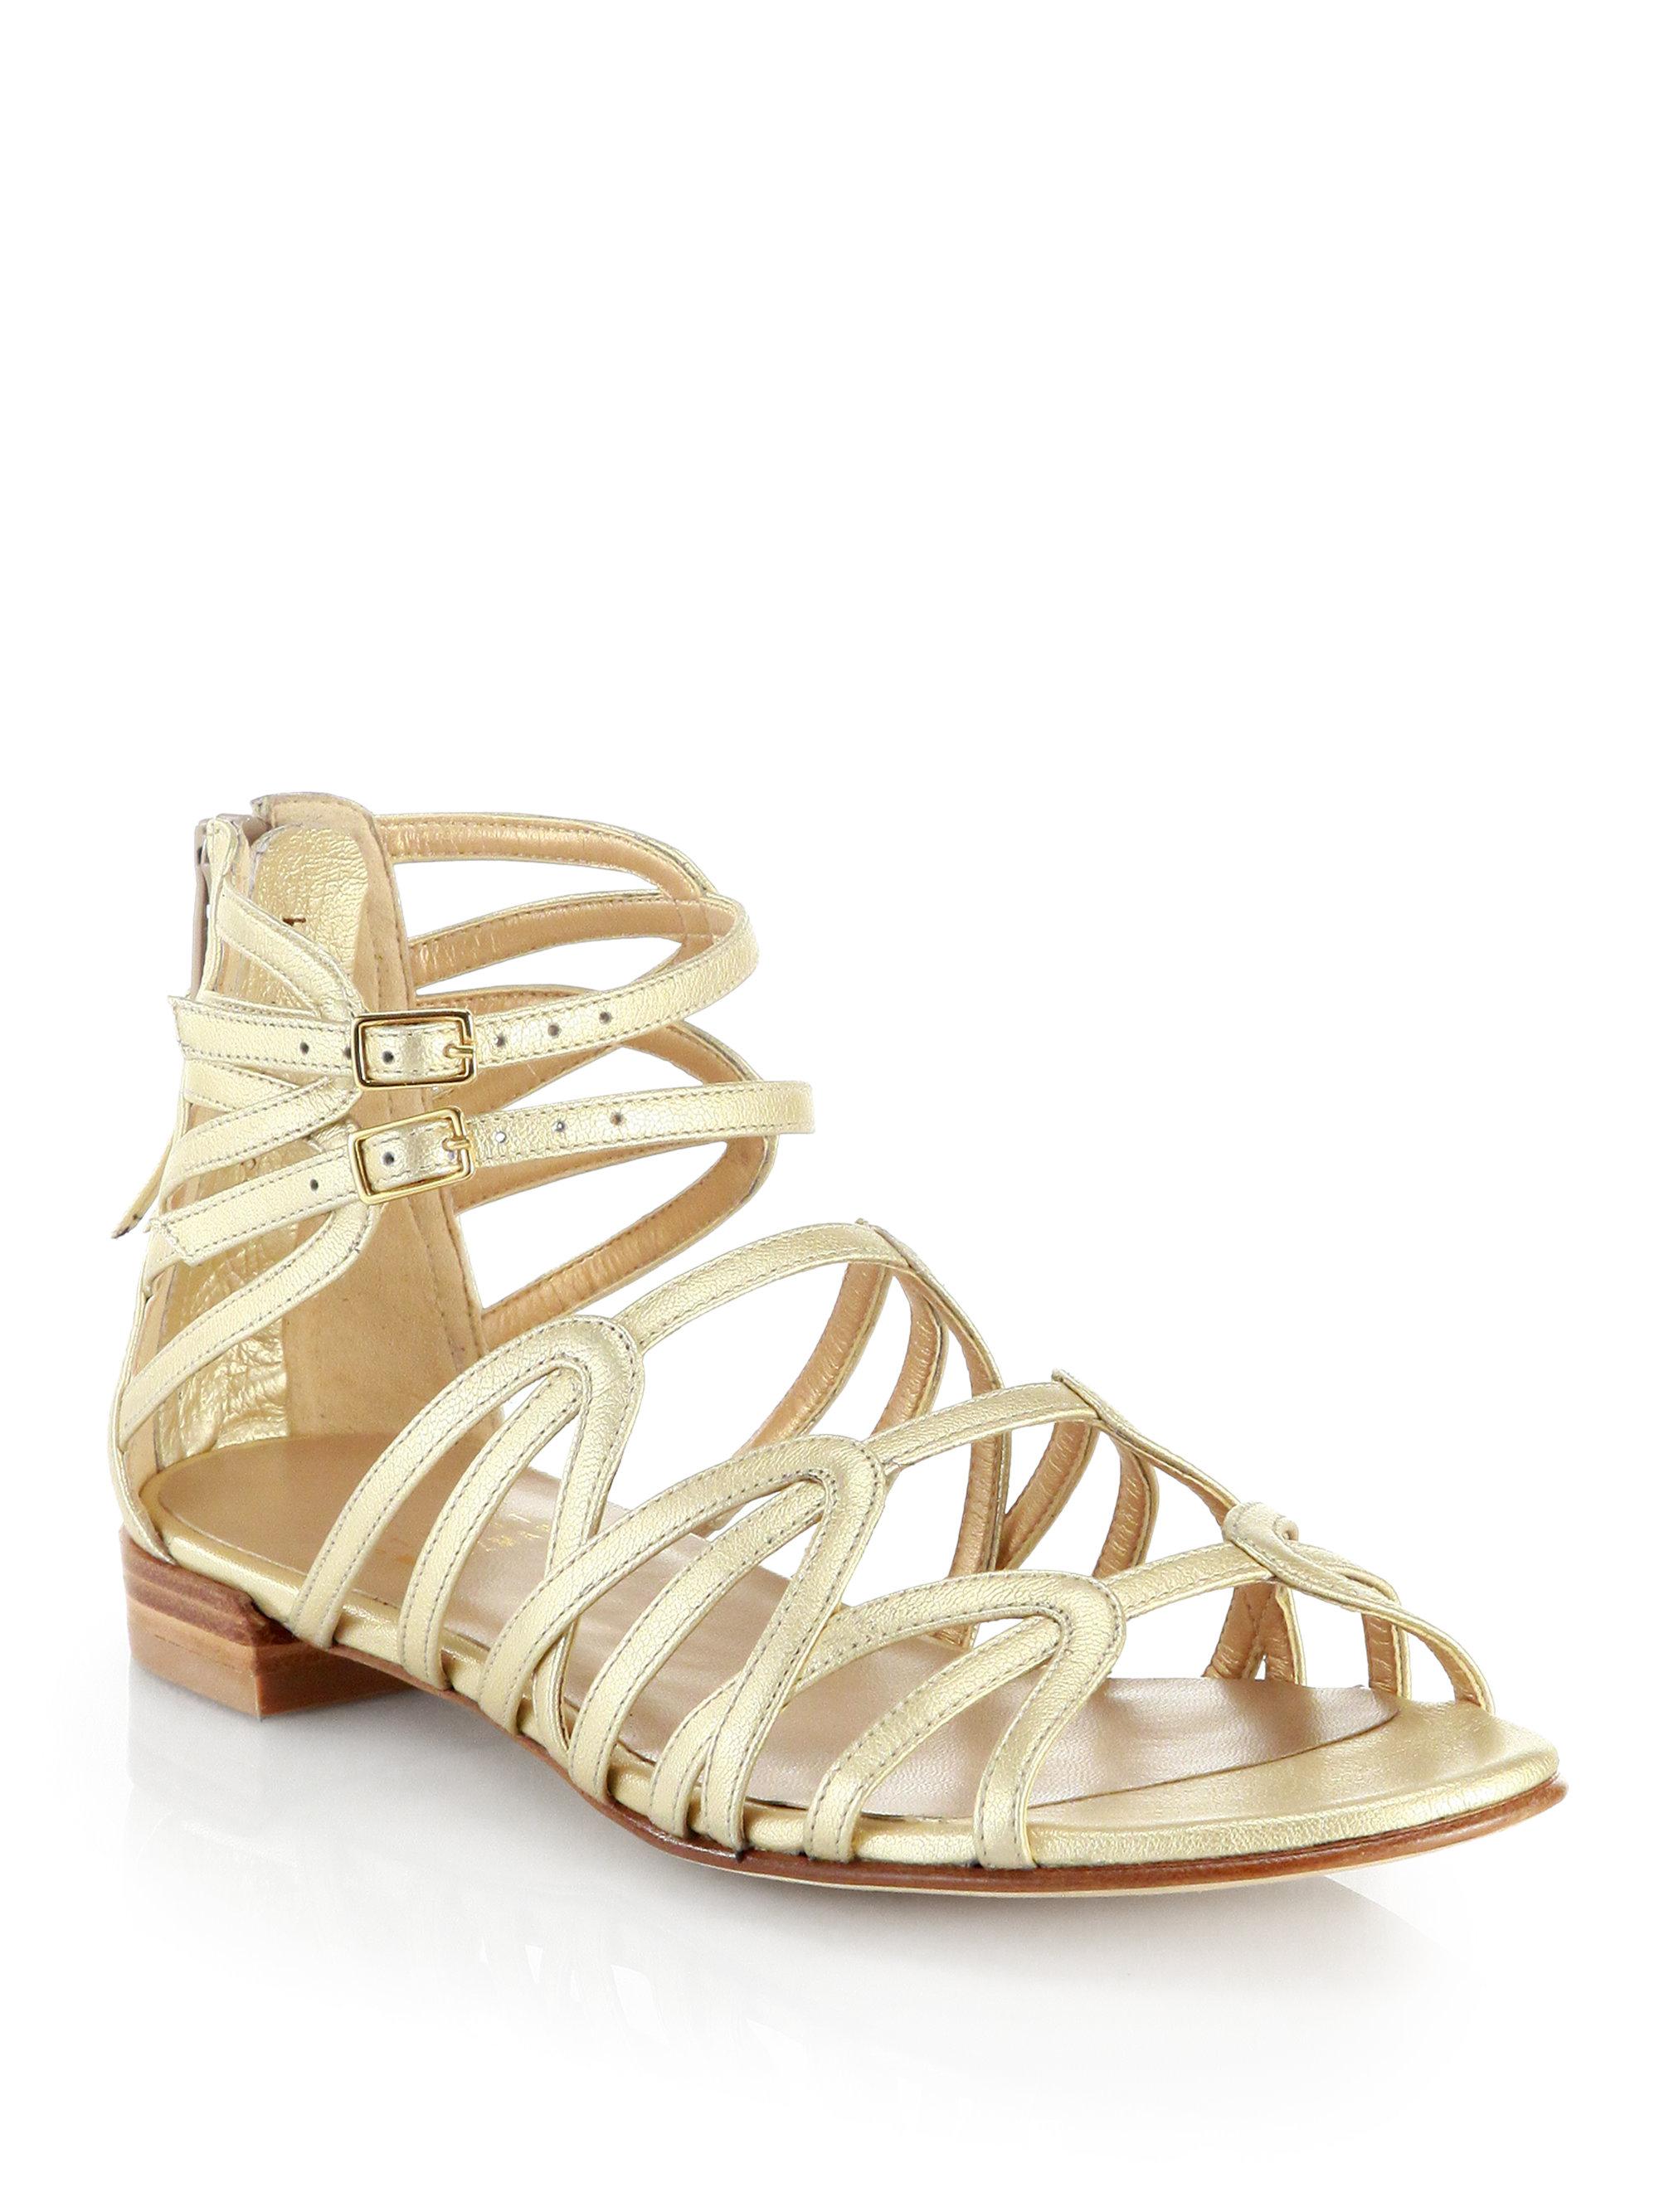 Gold Gladiator Heel Sandals